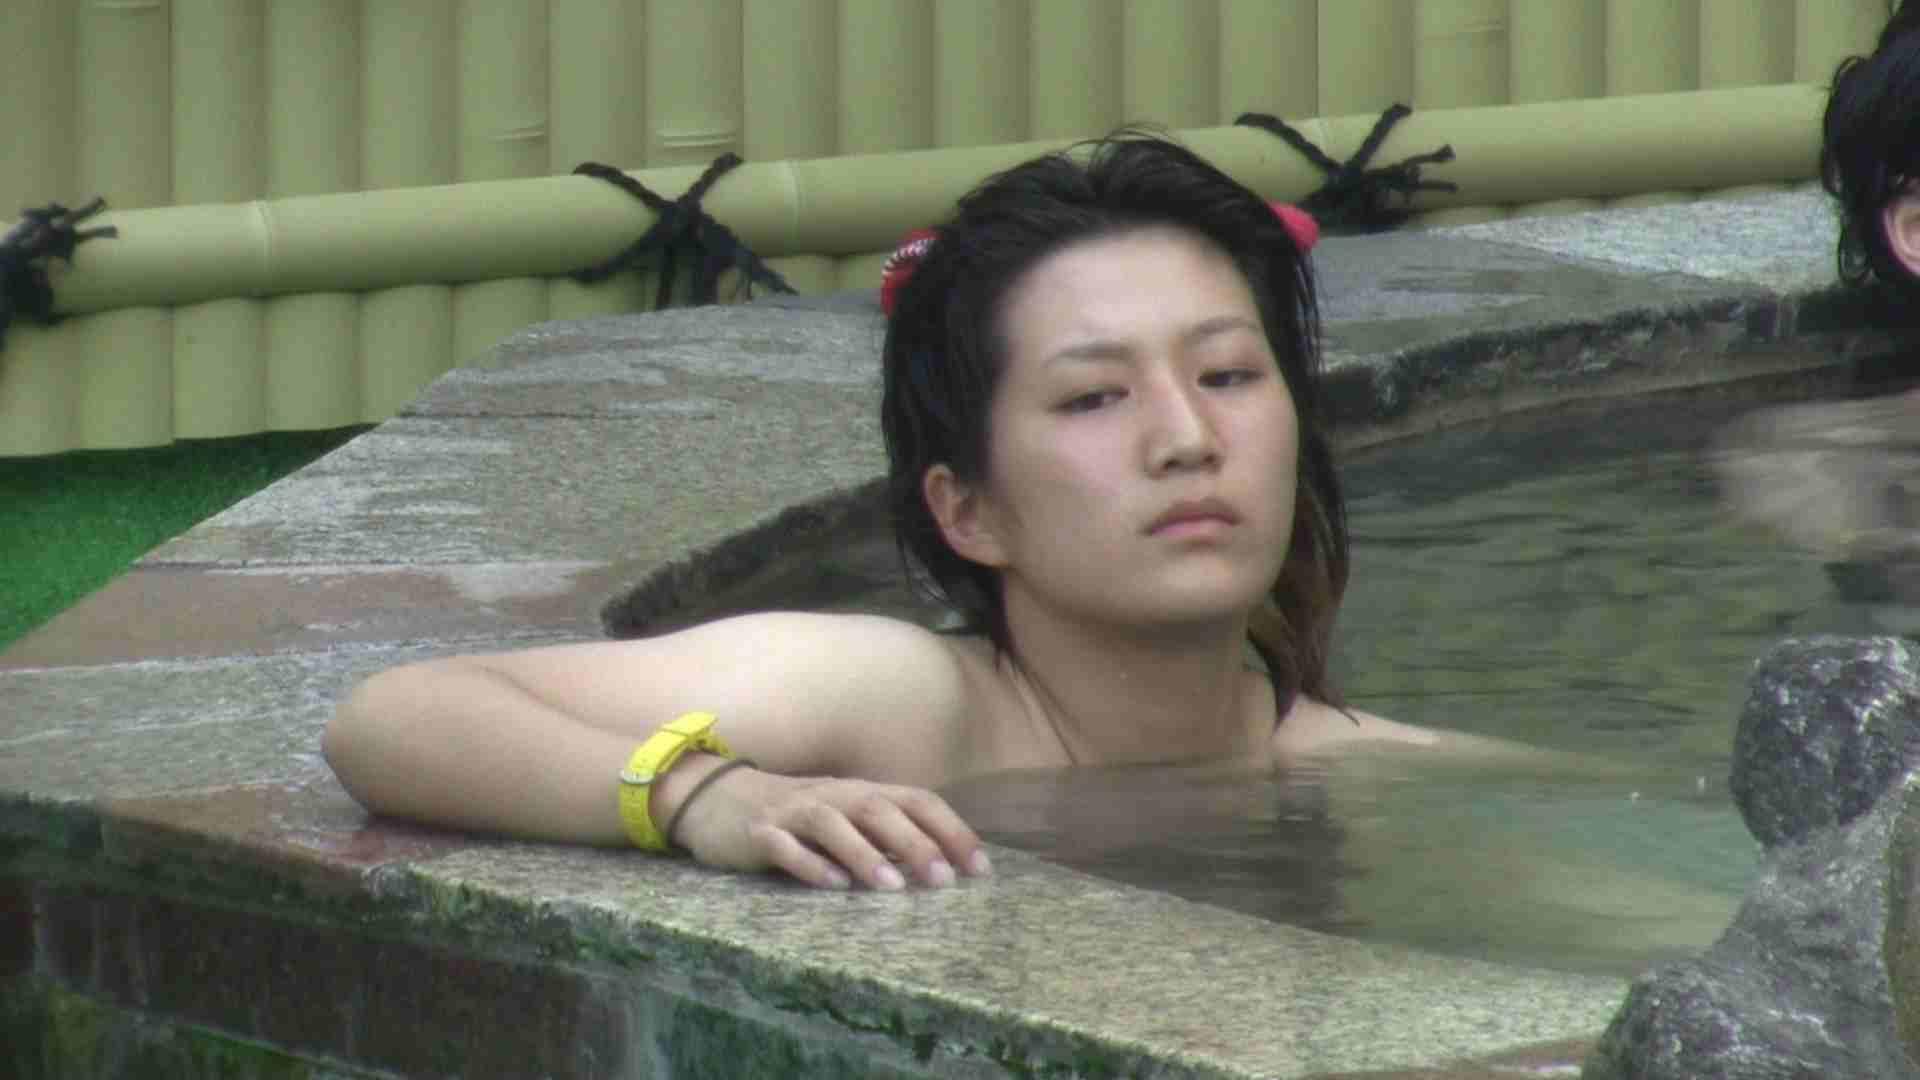 Aquaな露天風呂Vol.132 露天風呂編 | 盗撮シリーズ  78PIX 3